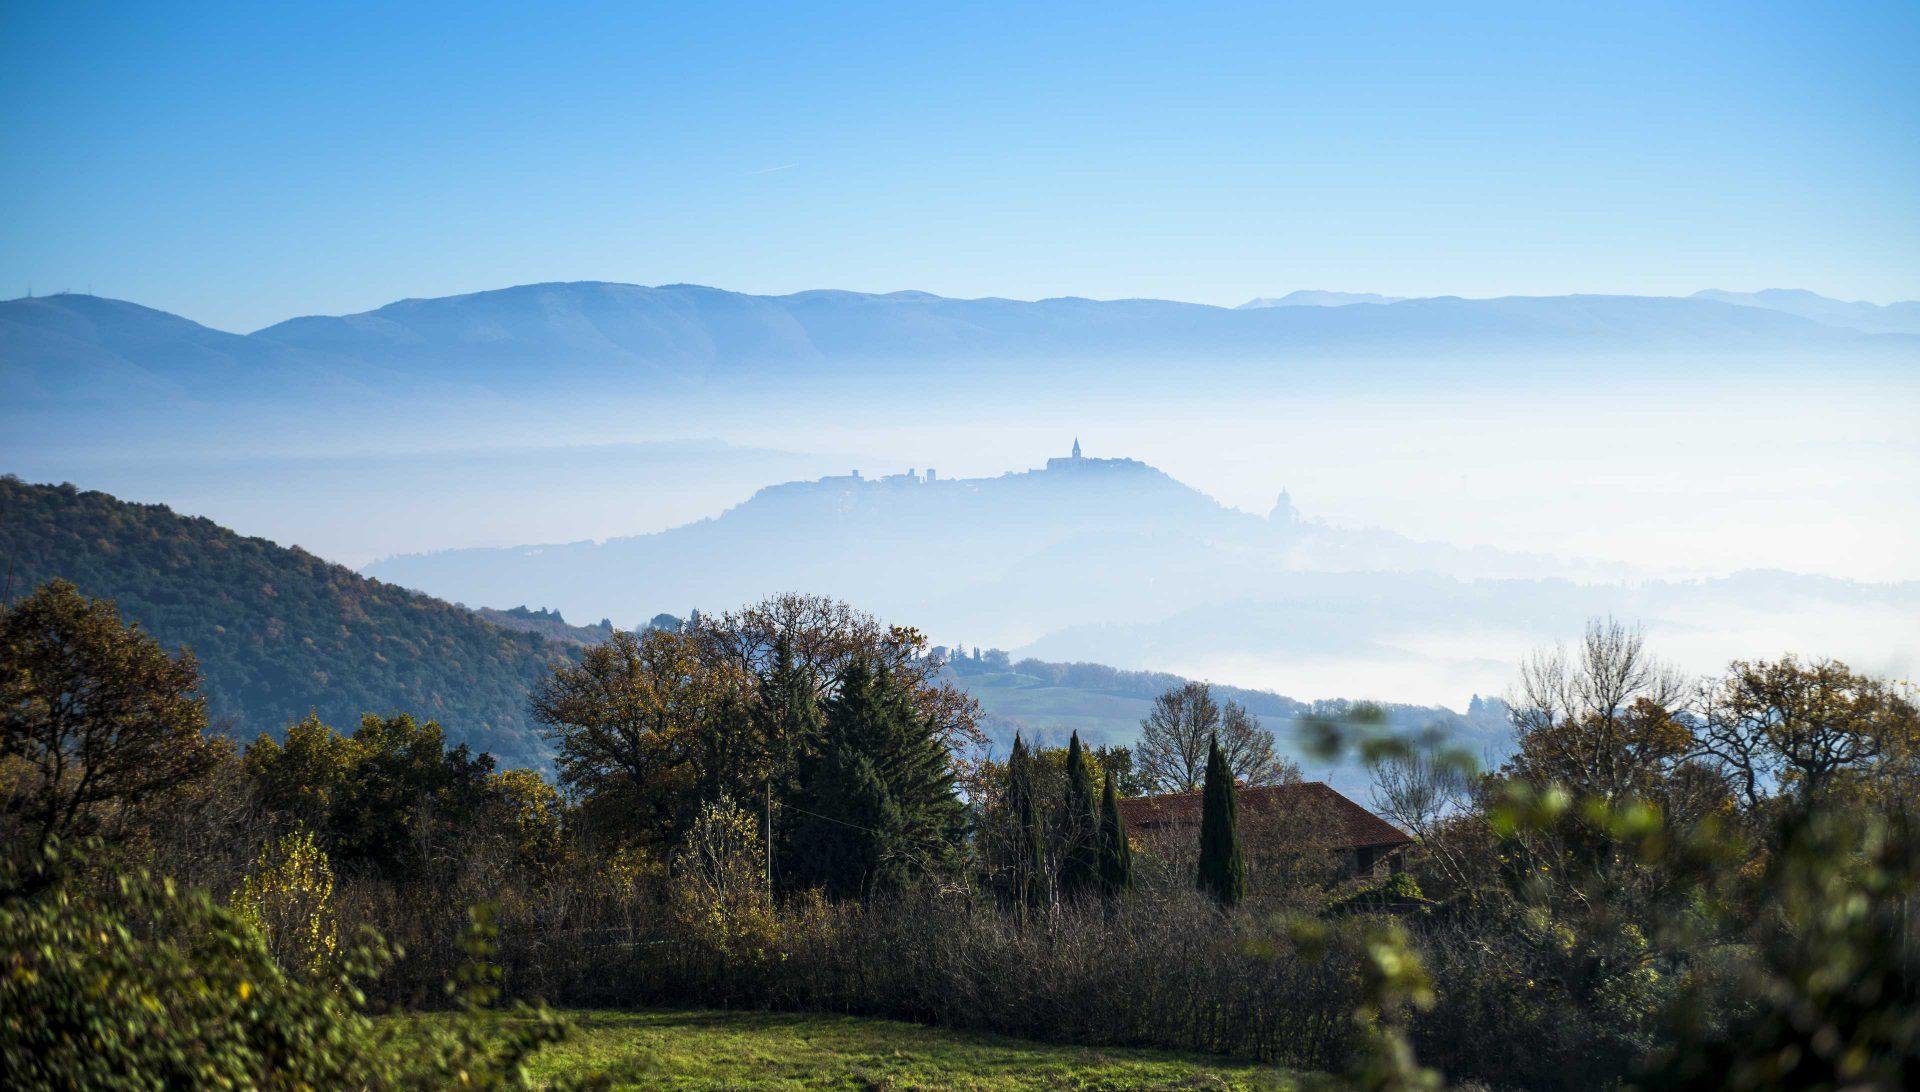 Hotel Fonte Cesia -Todi heart of Umbria - Hotel a Todi - Blog- Todi cuore dell'Umbria- walking tour - Umbria